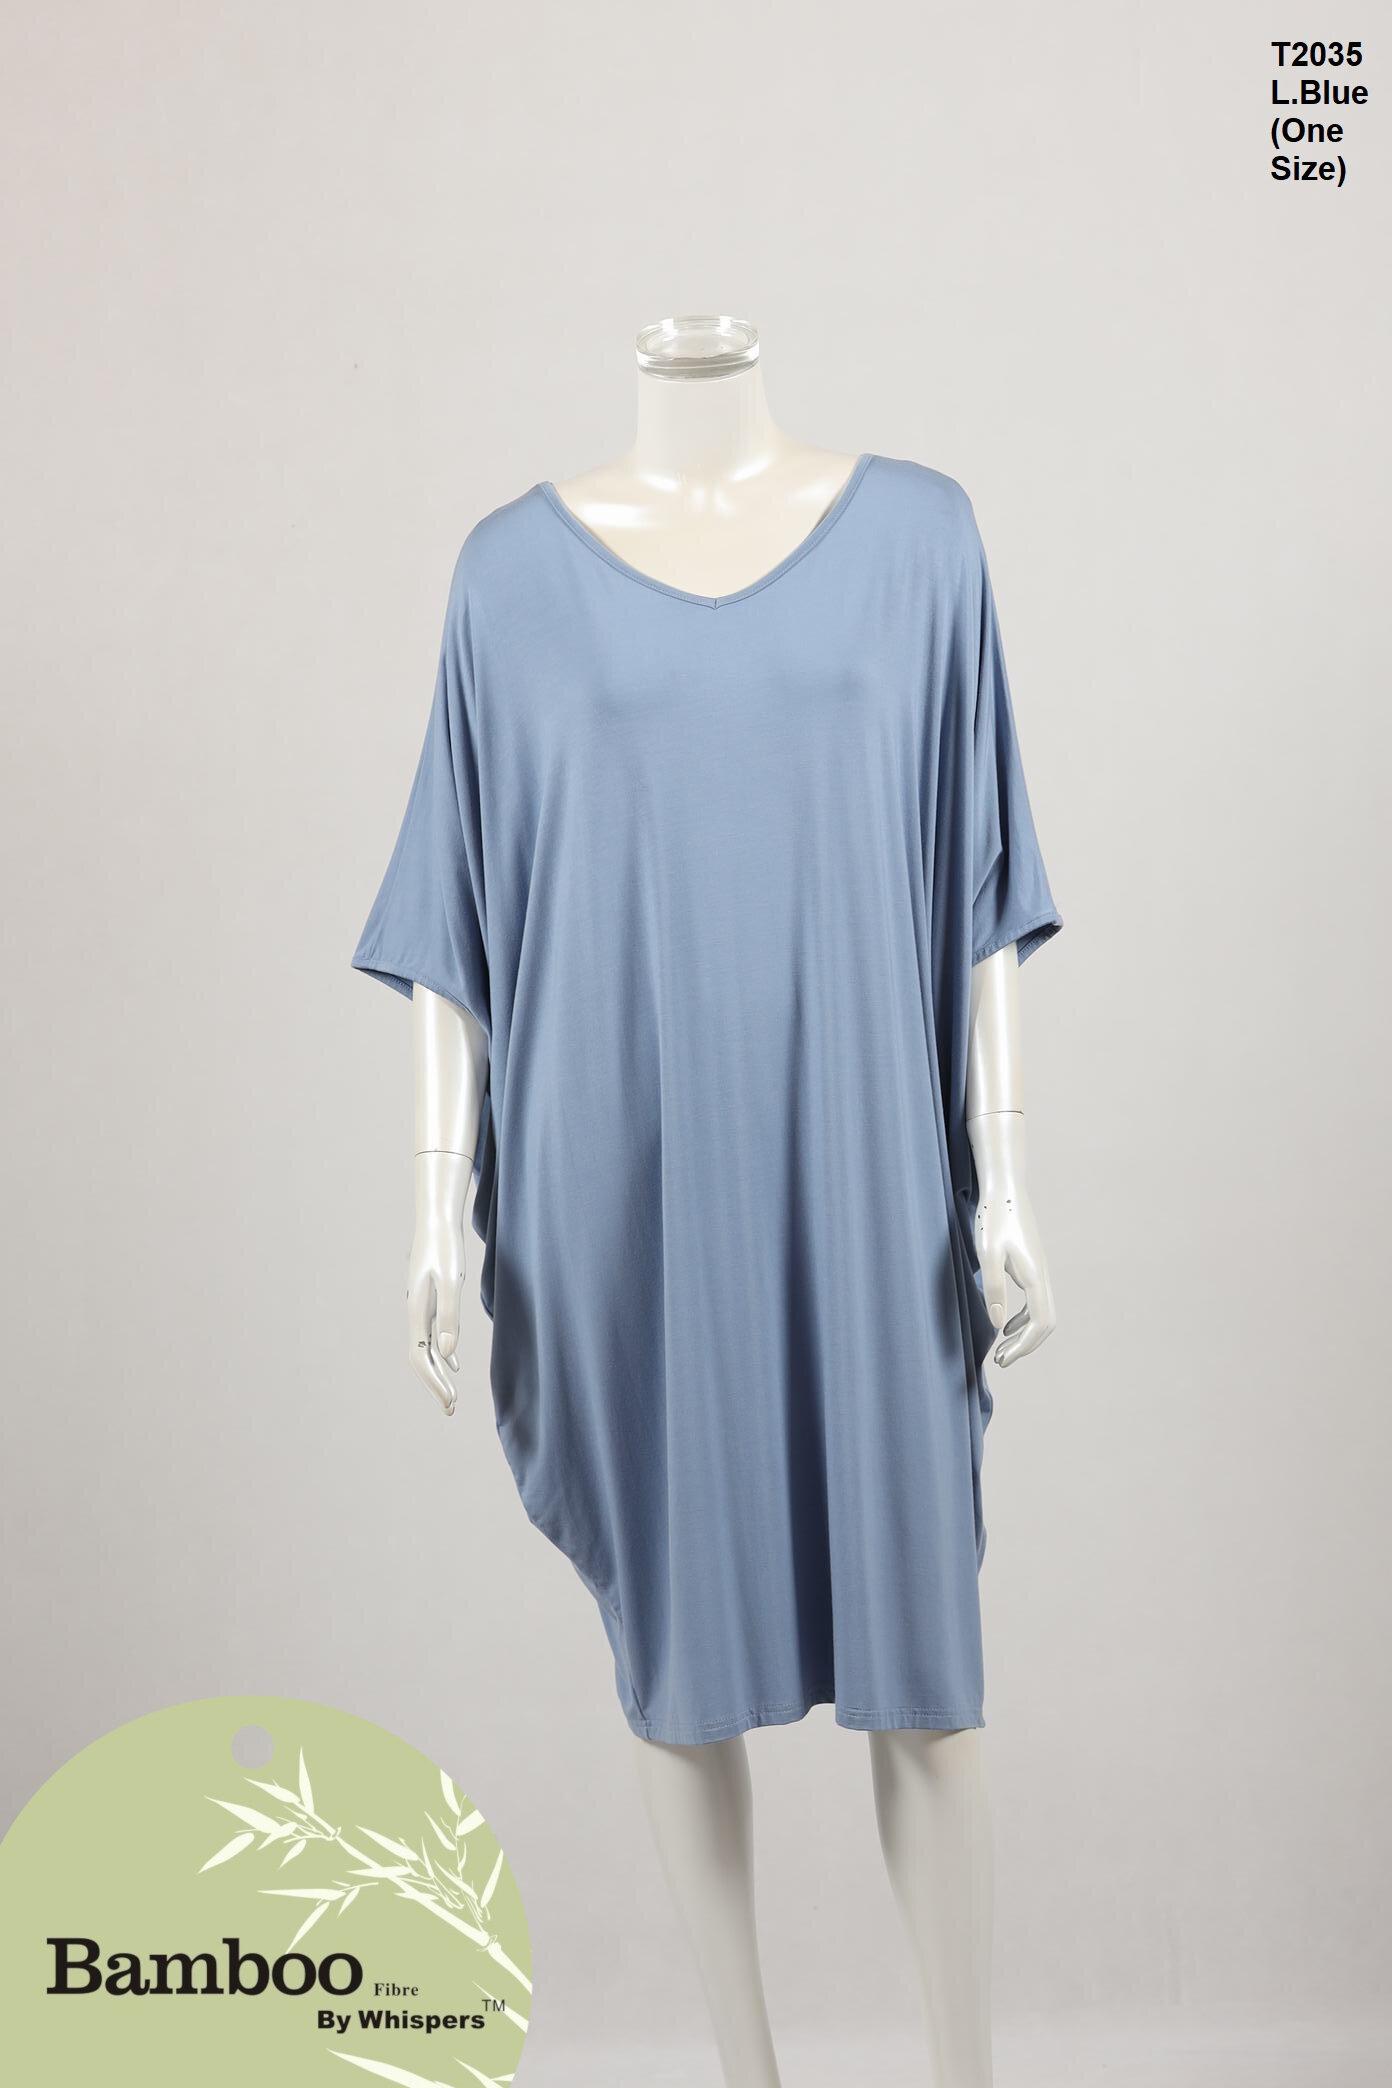 T2035-One Size-L.Blue.JPG